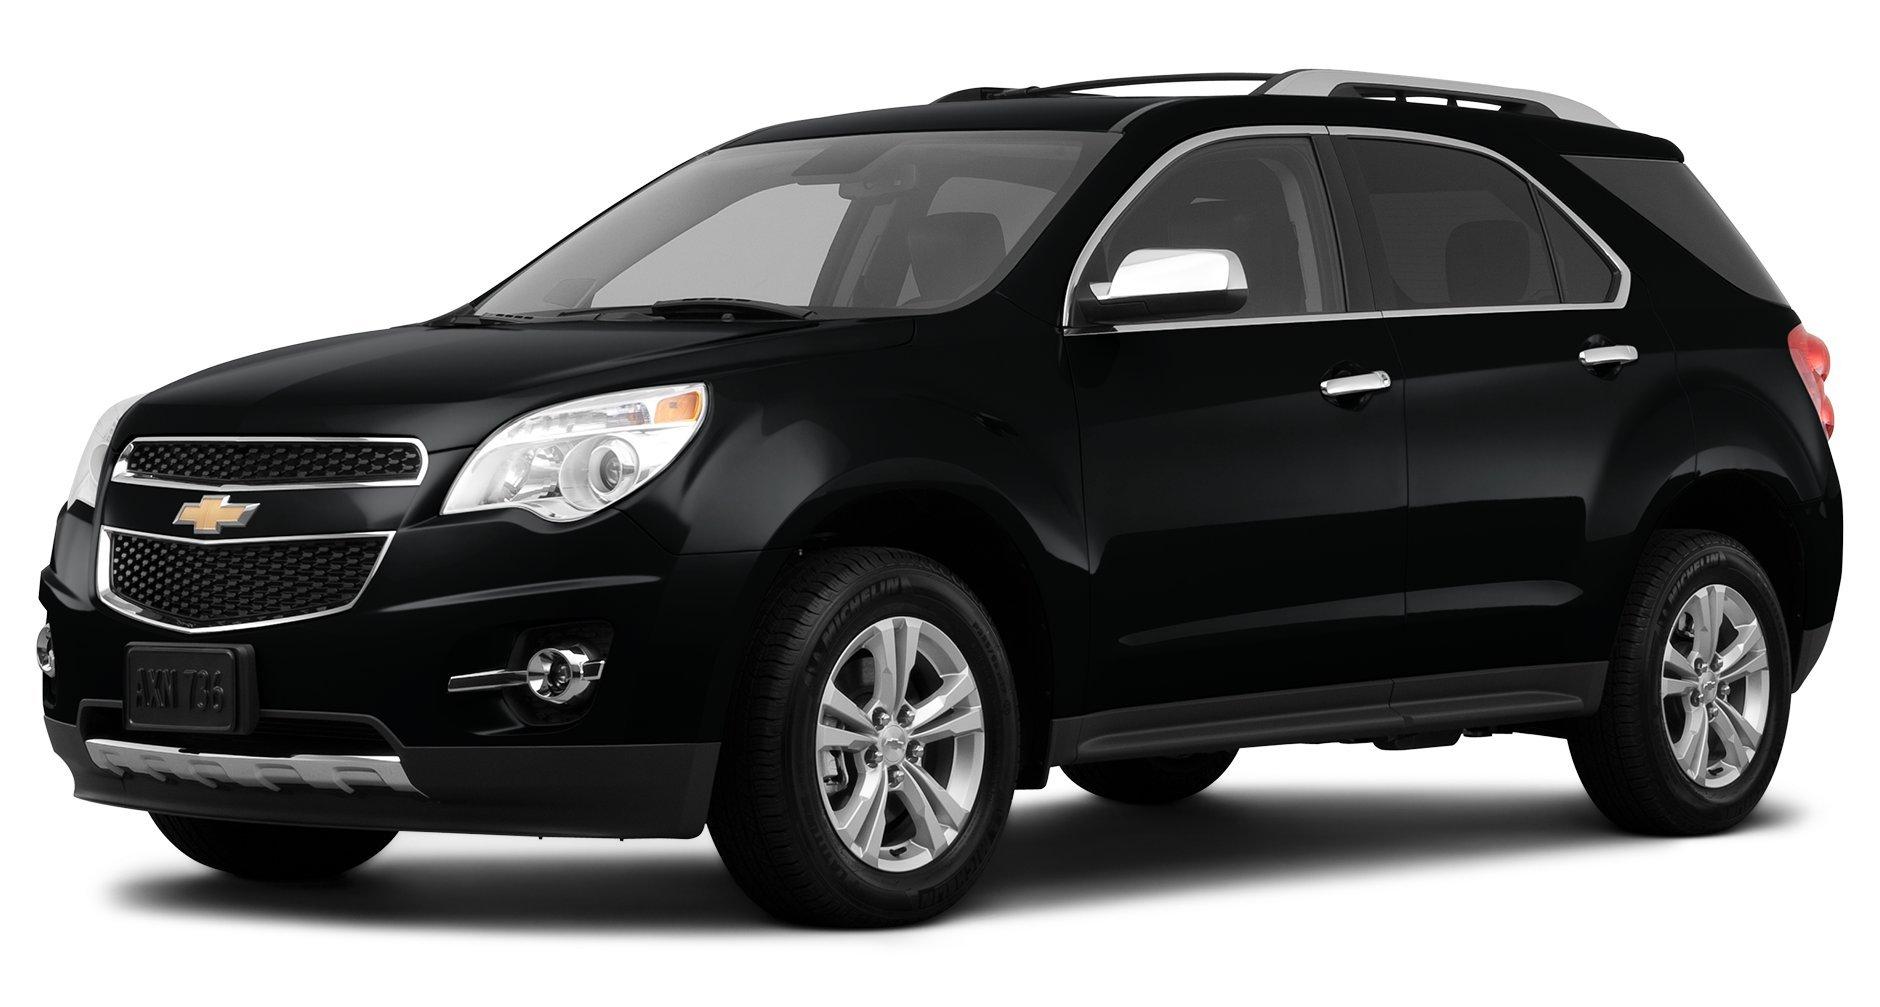 Amazon Com 2012 Chevrolet Equinox Ls Reviews Images And Specs Vehicles